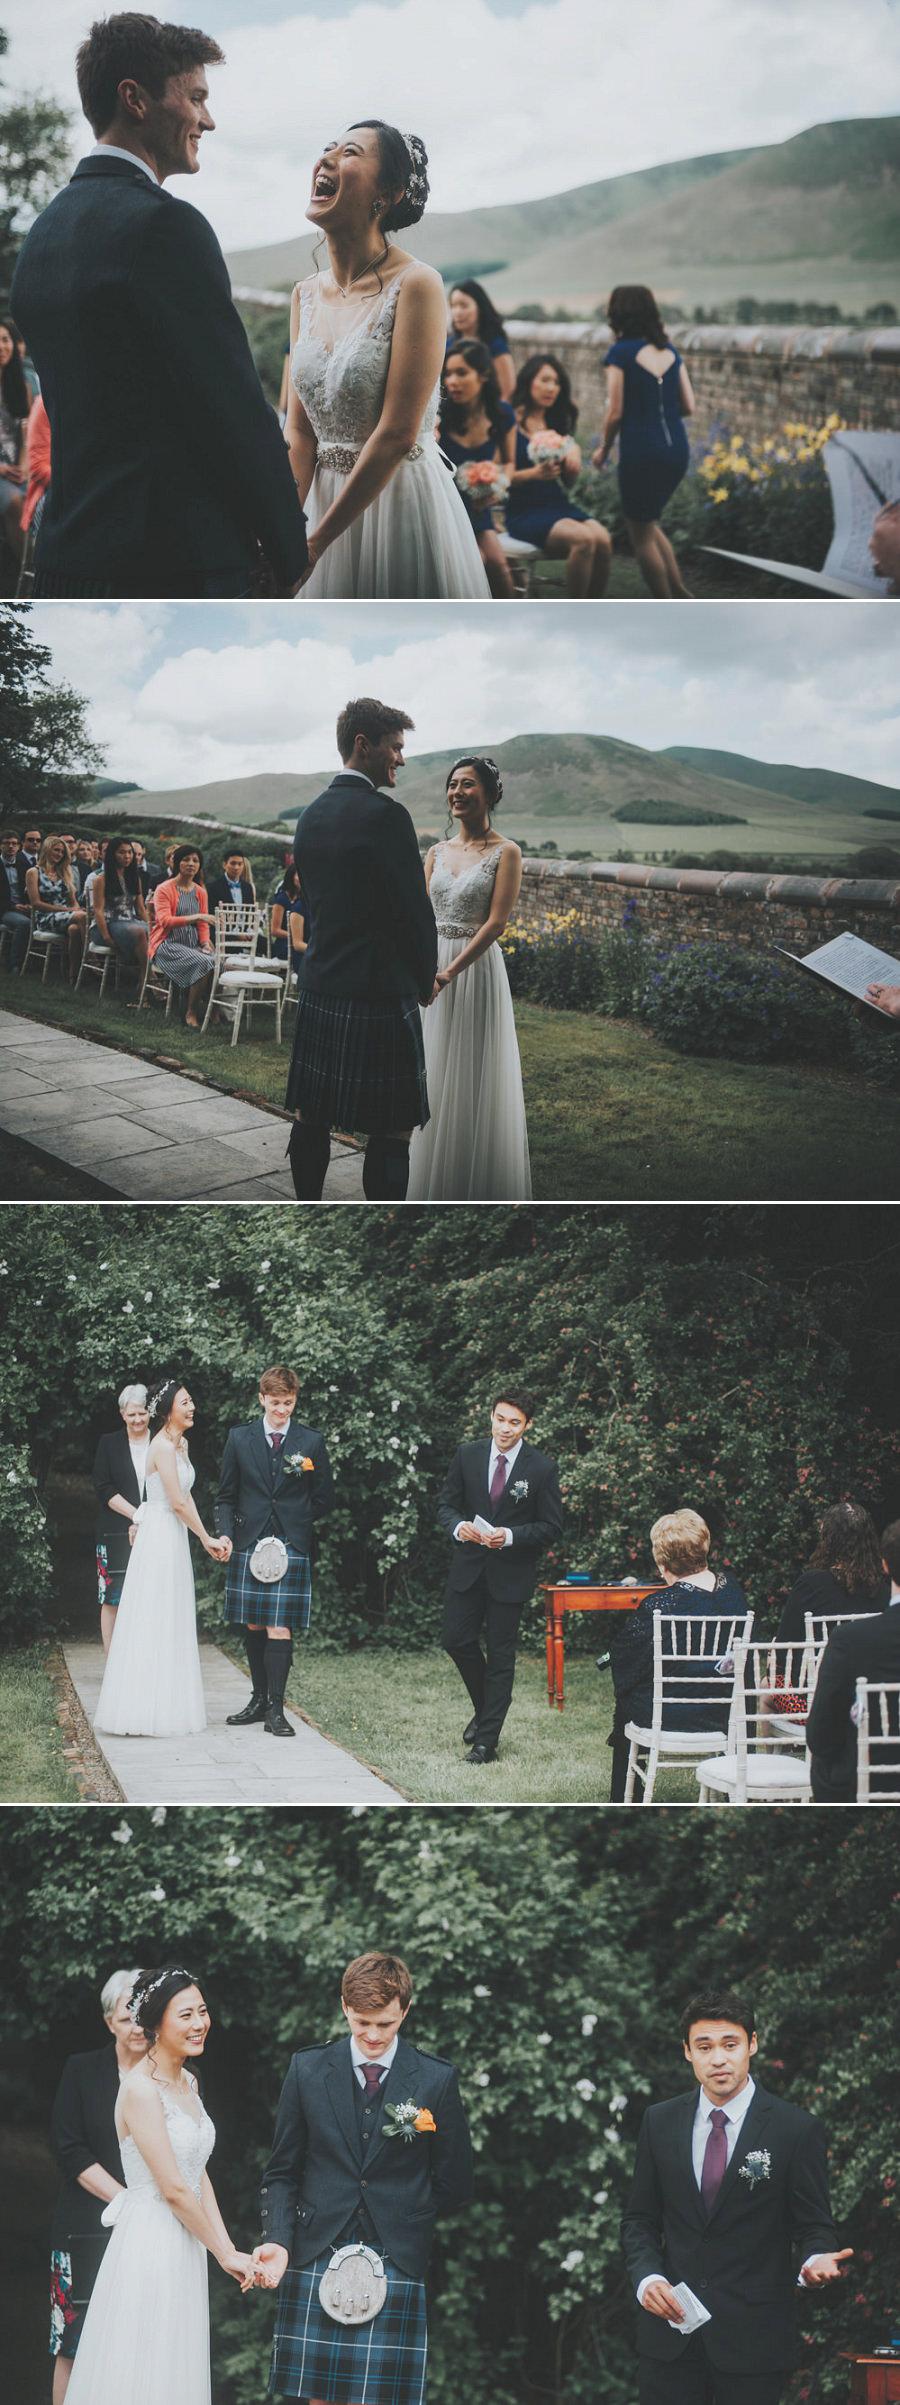 scottish-wedding-photography-vintage-photographer-019.jpg